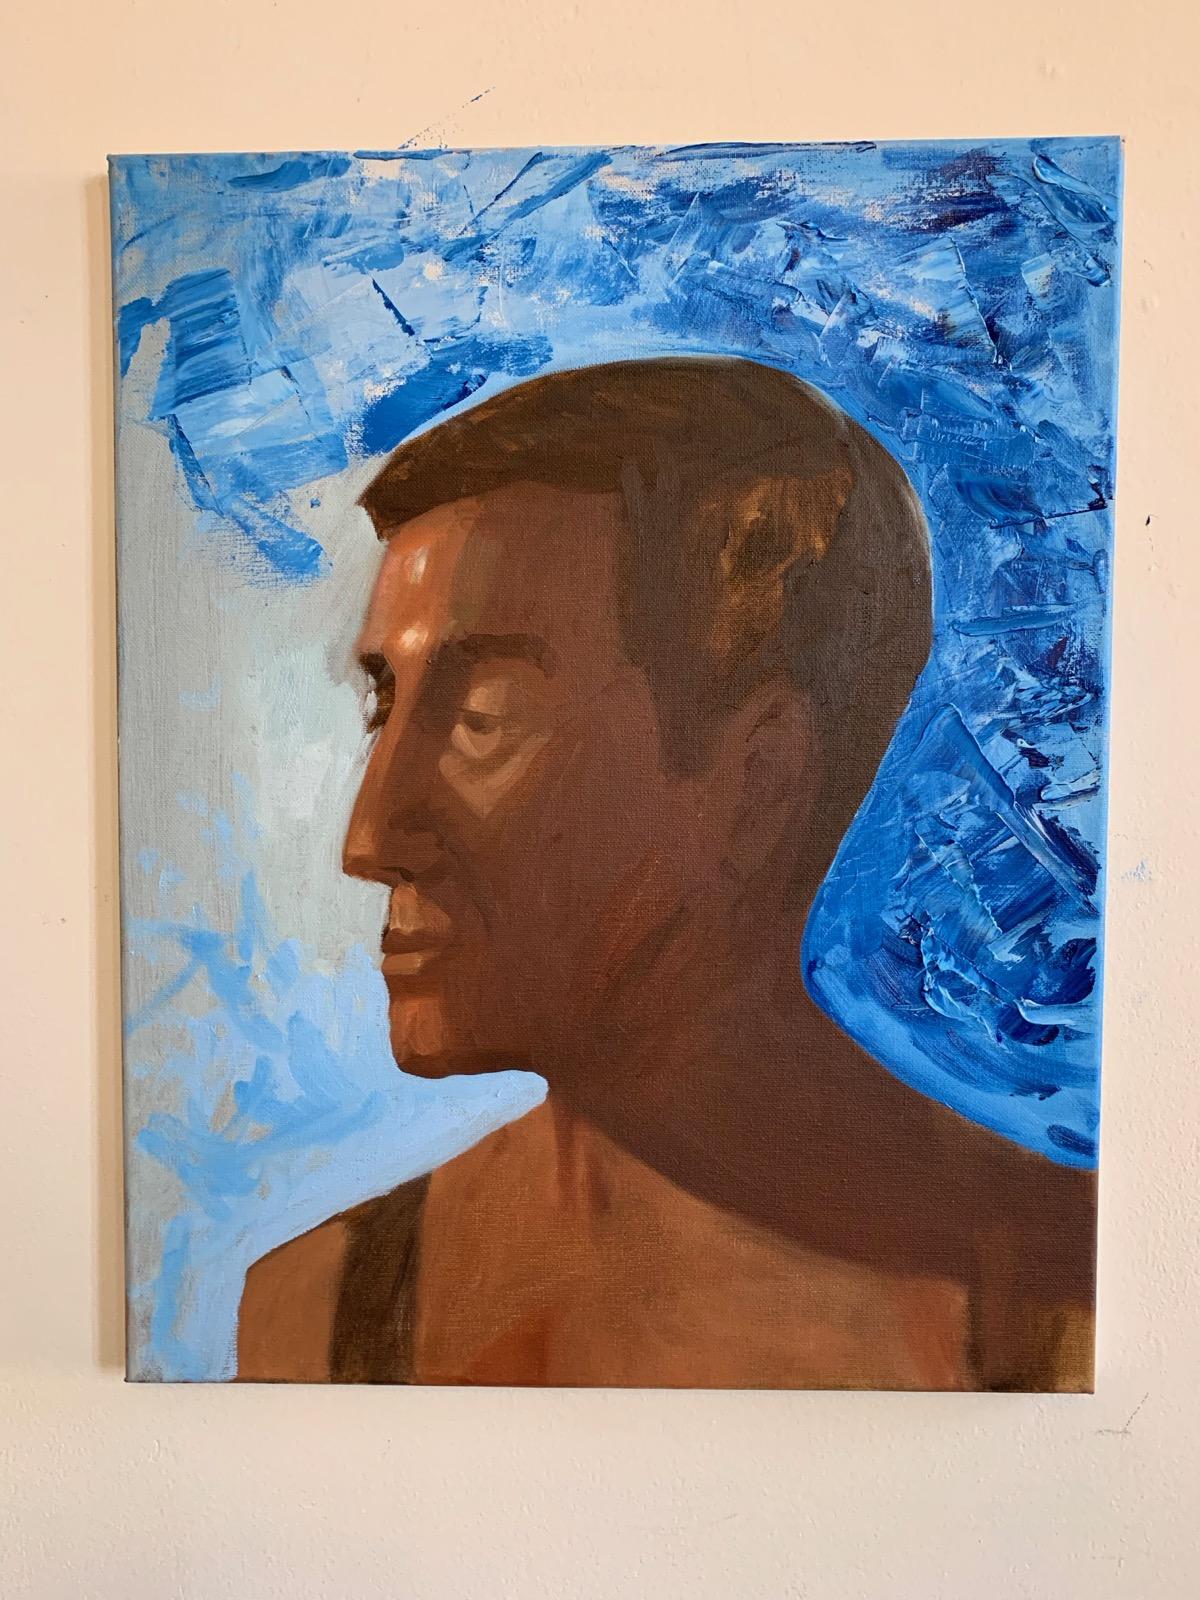 1st Portrait by Stephanie Echeveste, from Manu Saluja's class (1st session)